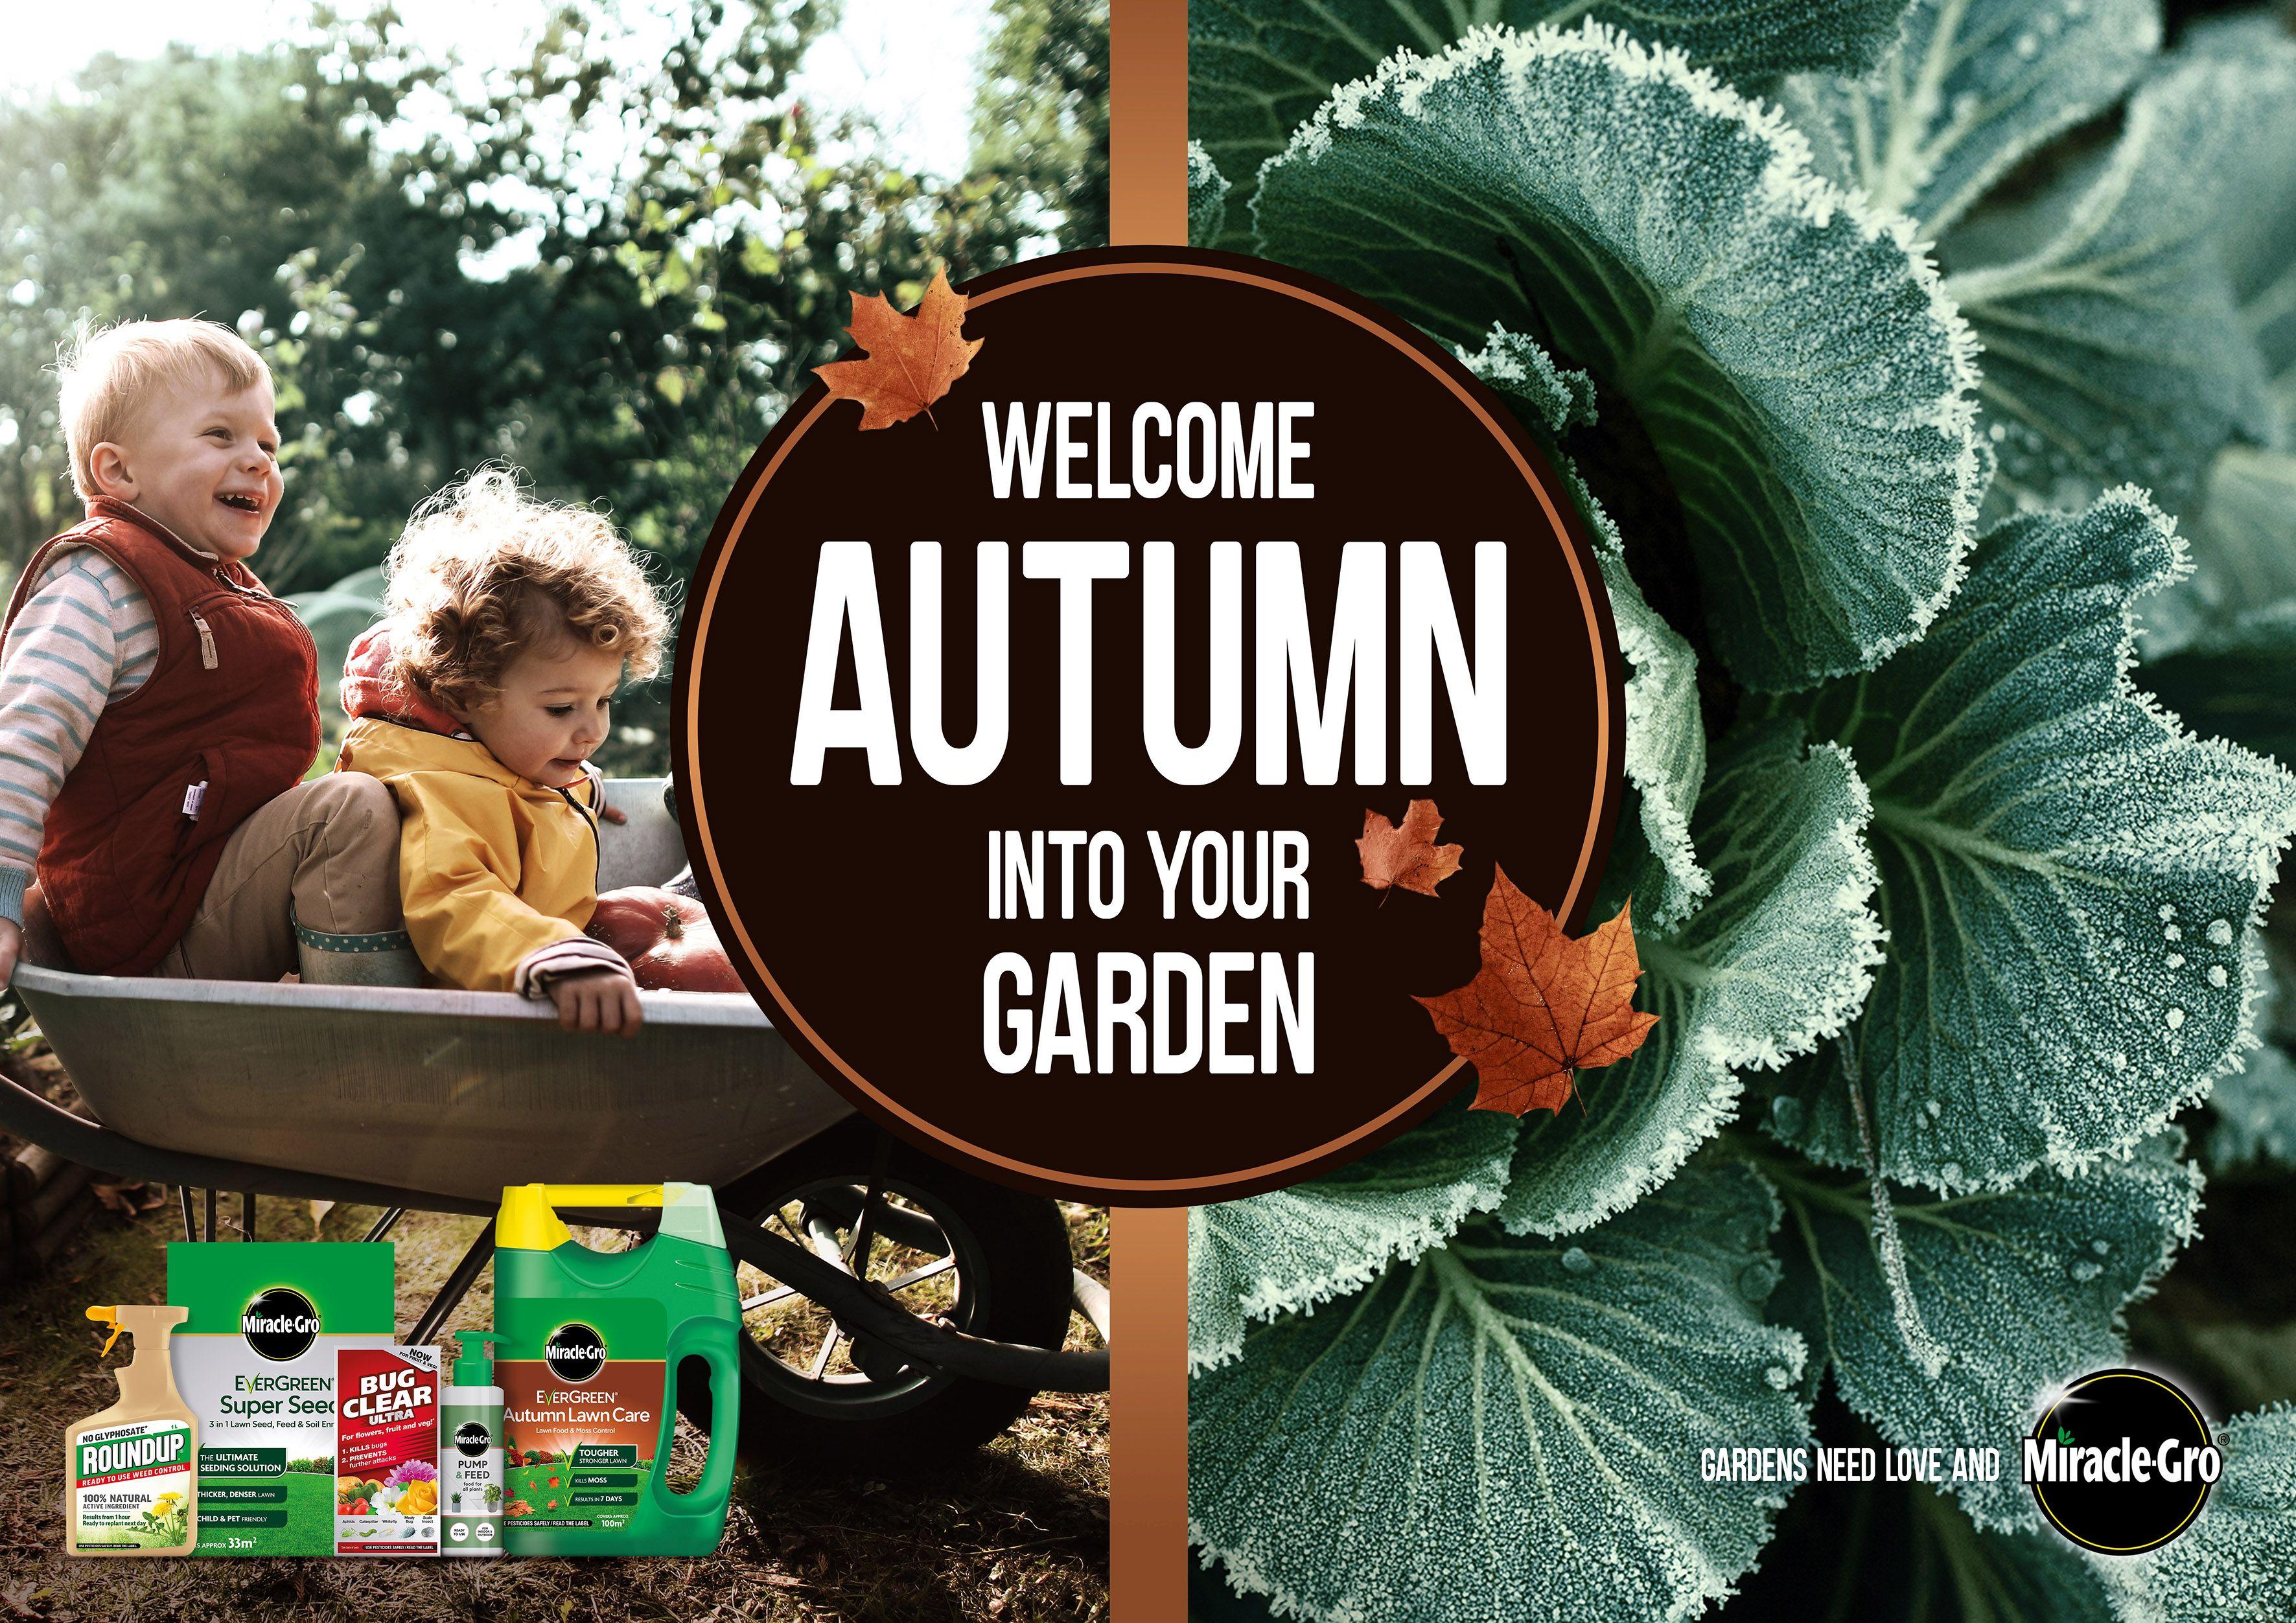 Evergreen Garden Care - Autumn Campaign Trade Press Release 2020